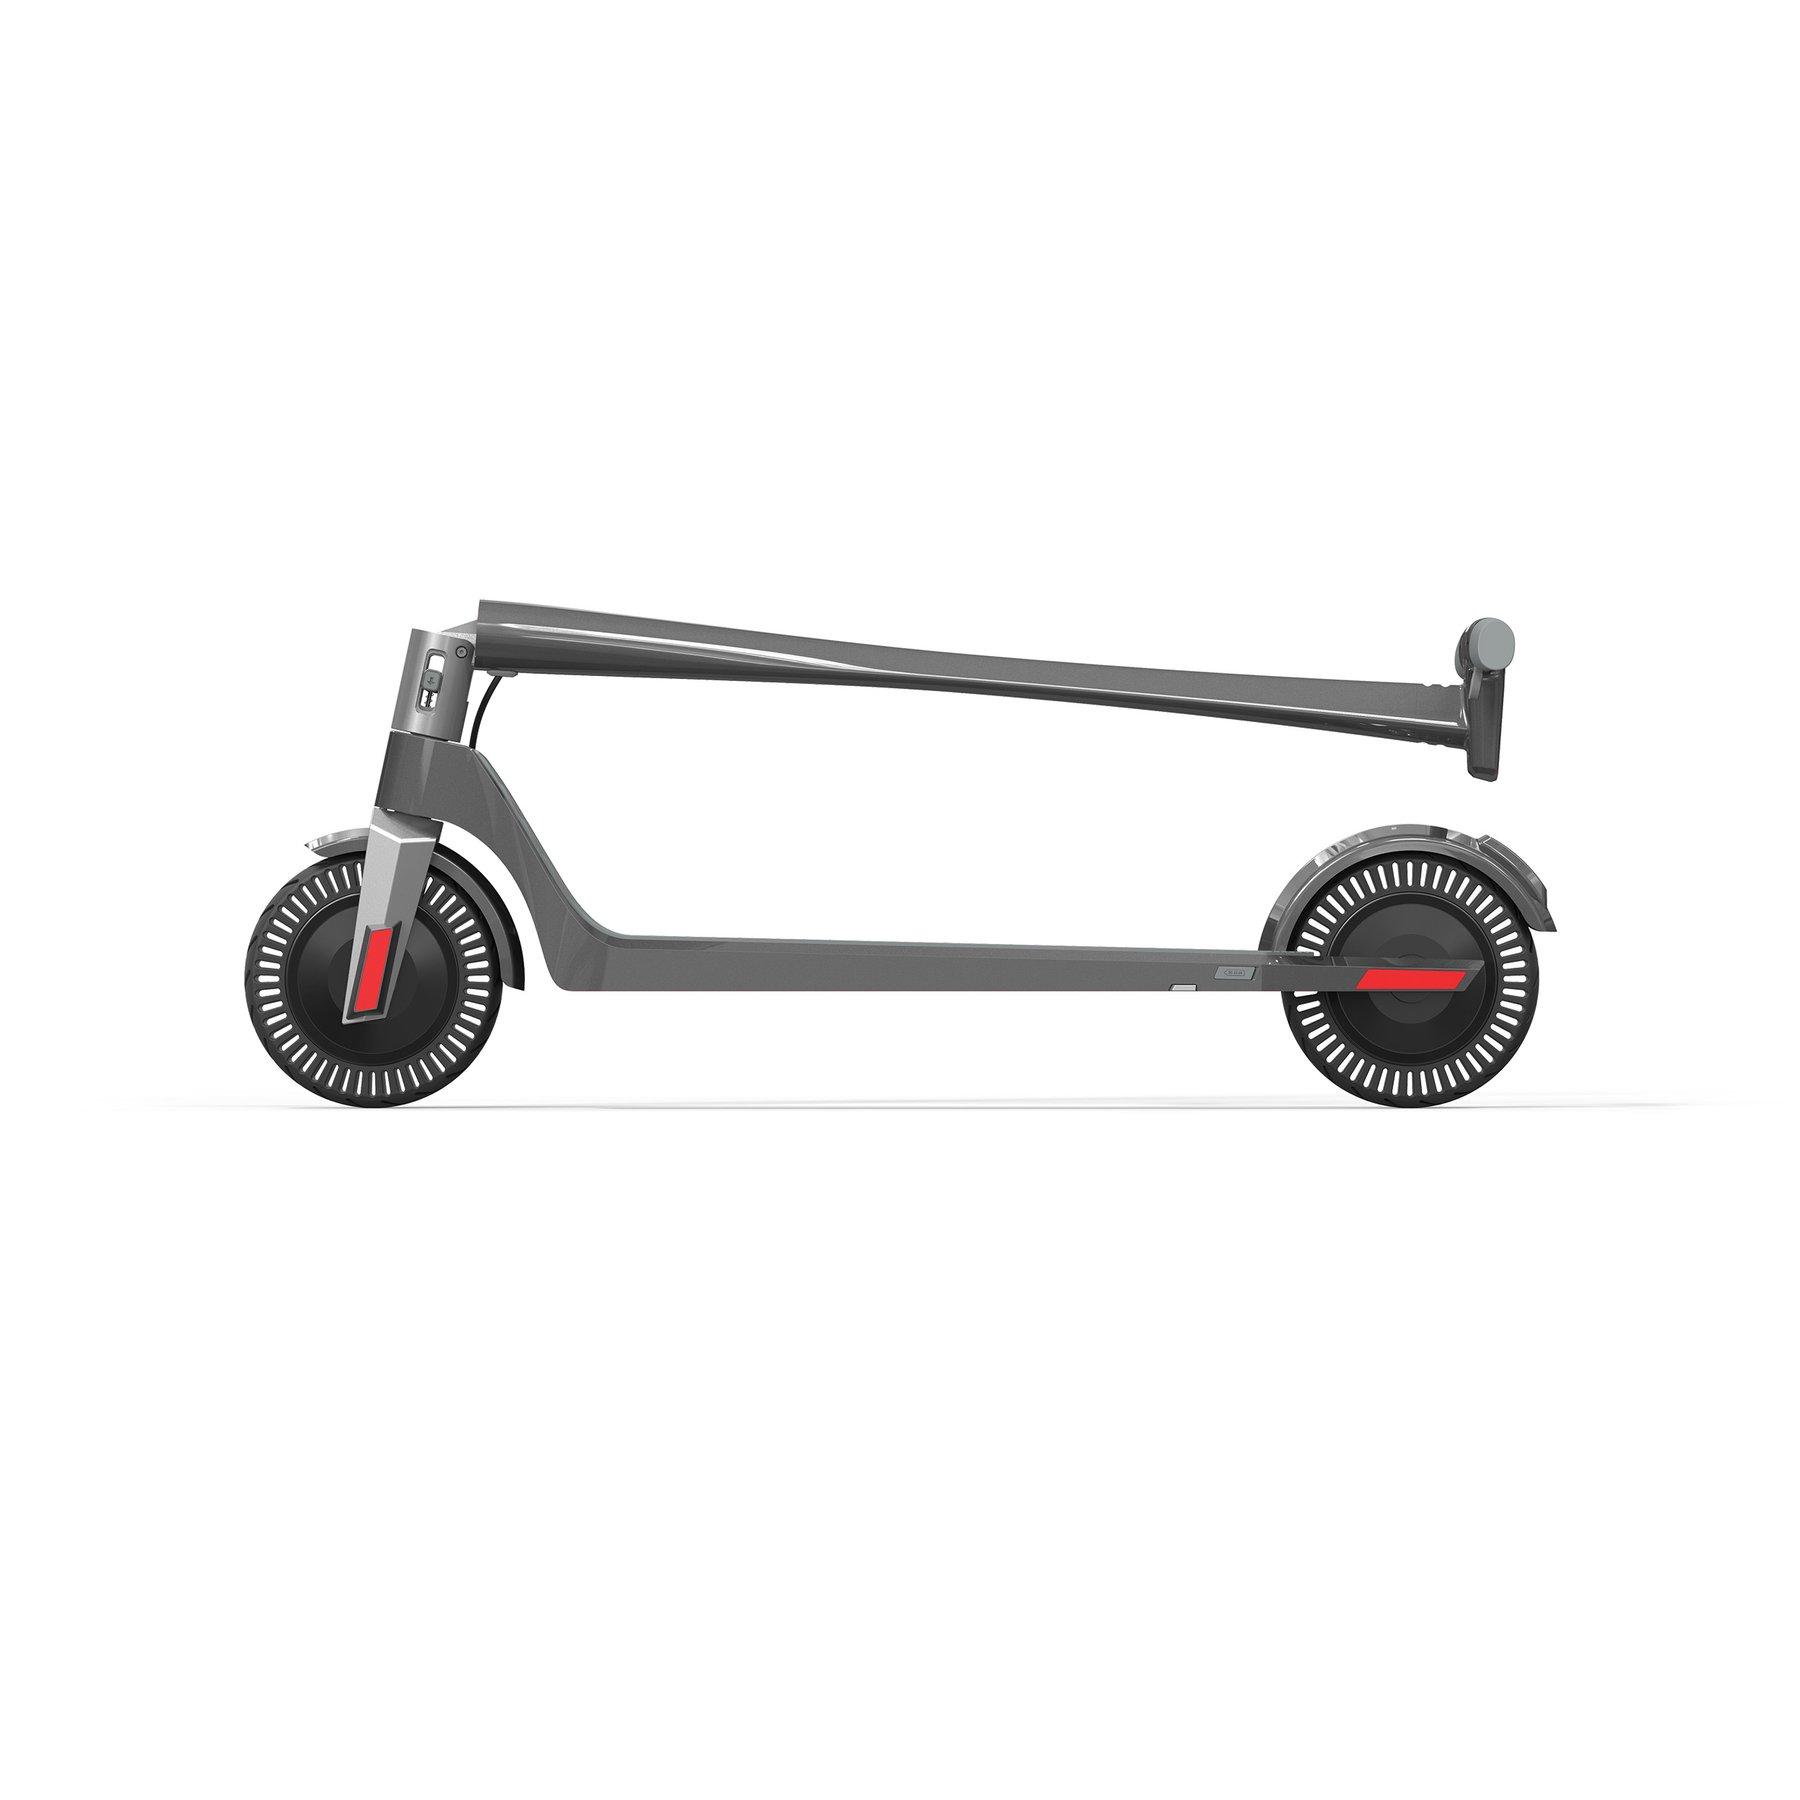 scooter_gotham_016_1800x1800.jpg